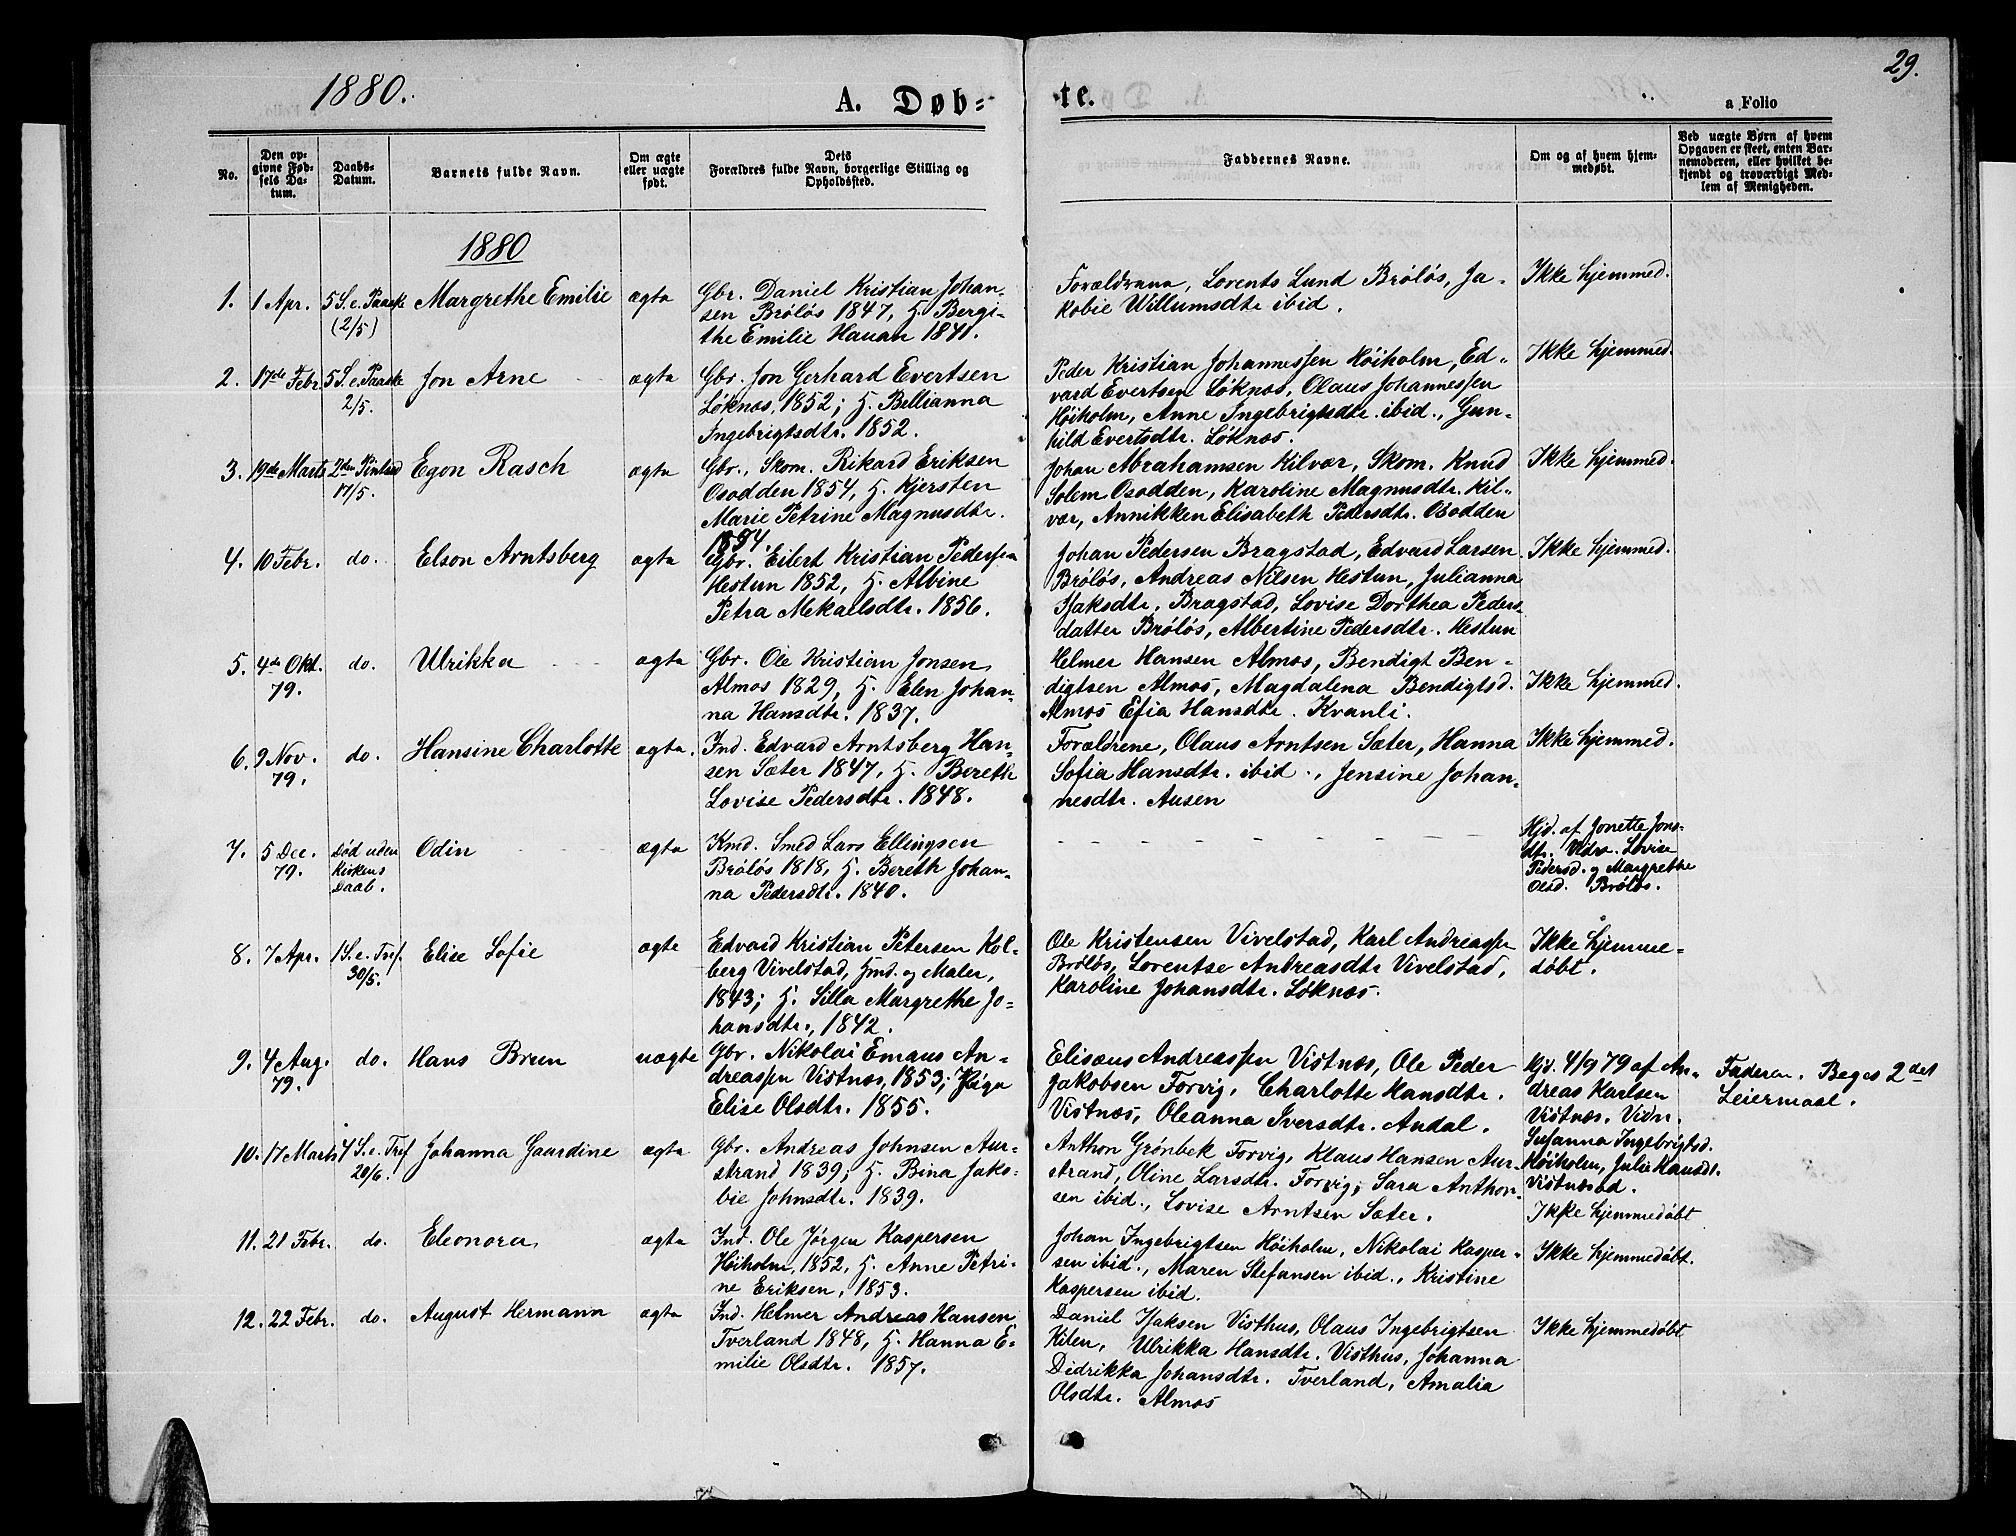 SAT, Ministerialprotokoller, klokkerbøker og fødselsregistre - Nordland, 819/L0276: Klokkerbok nr. 819C02, 1869-1887, s. 29